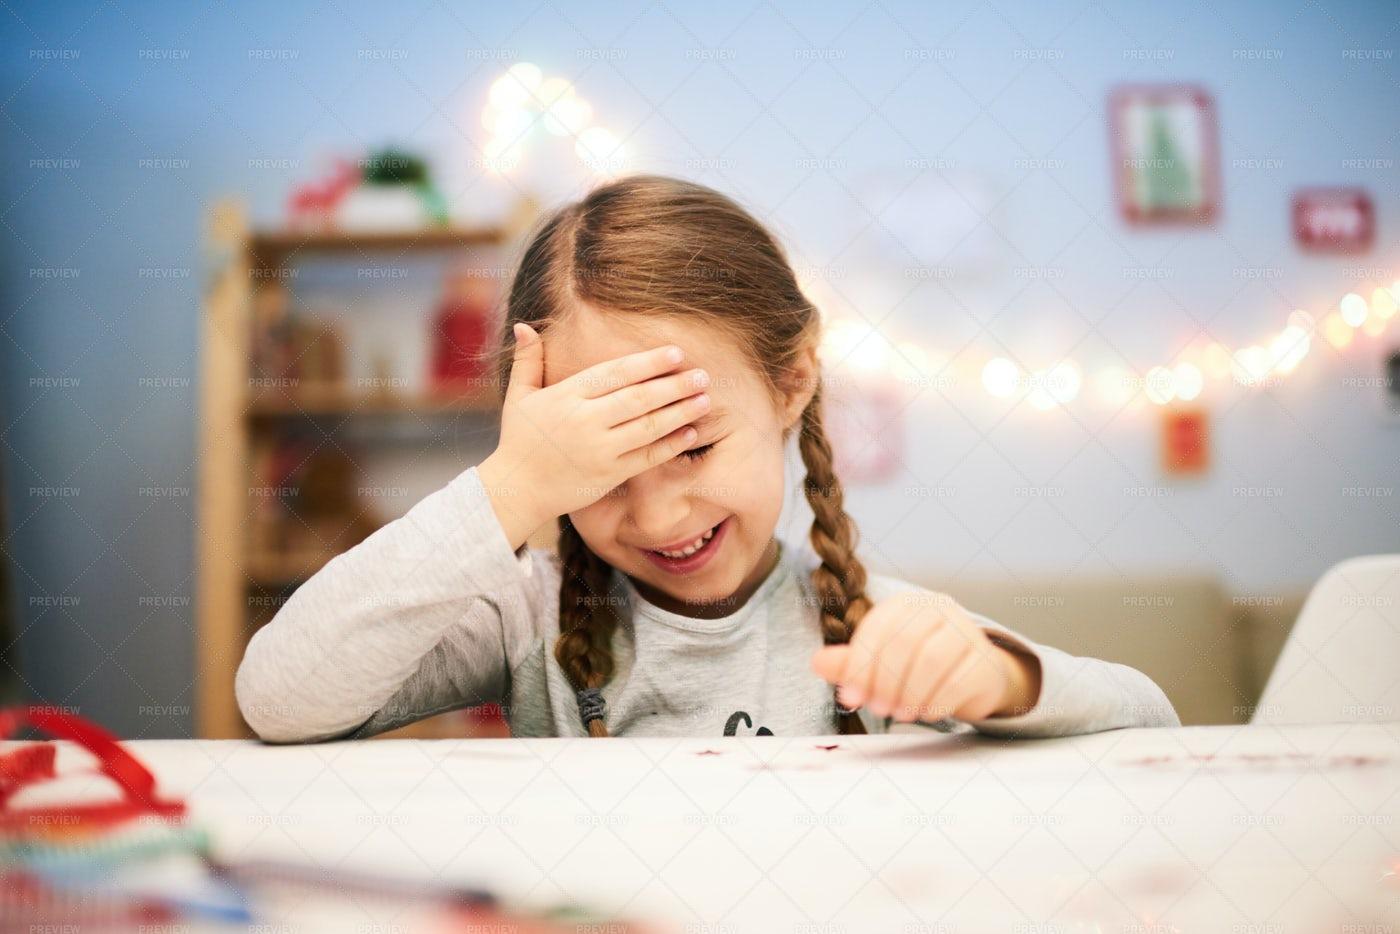 Little Girl Making Christmas Card: Stock Photos